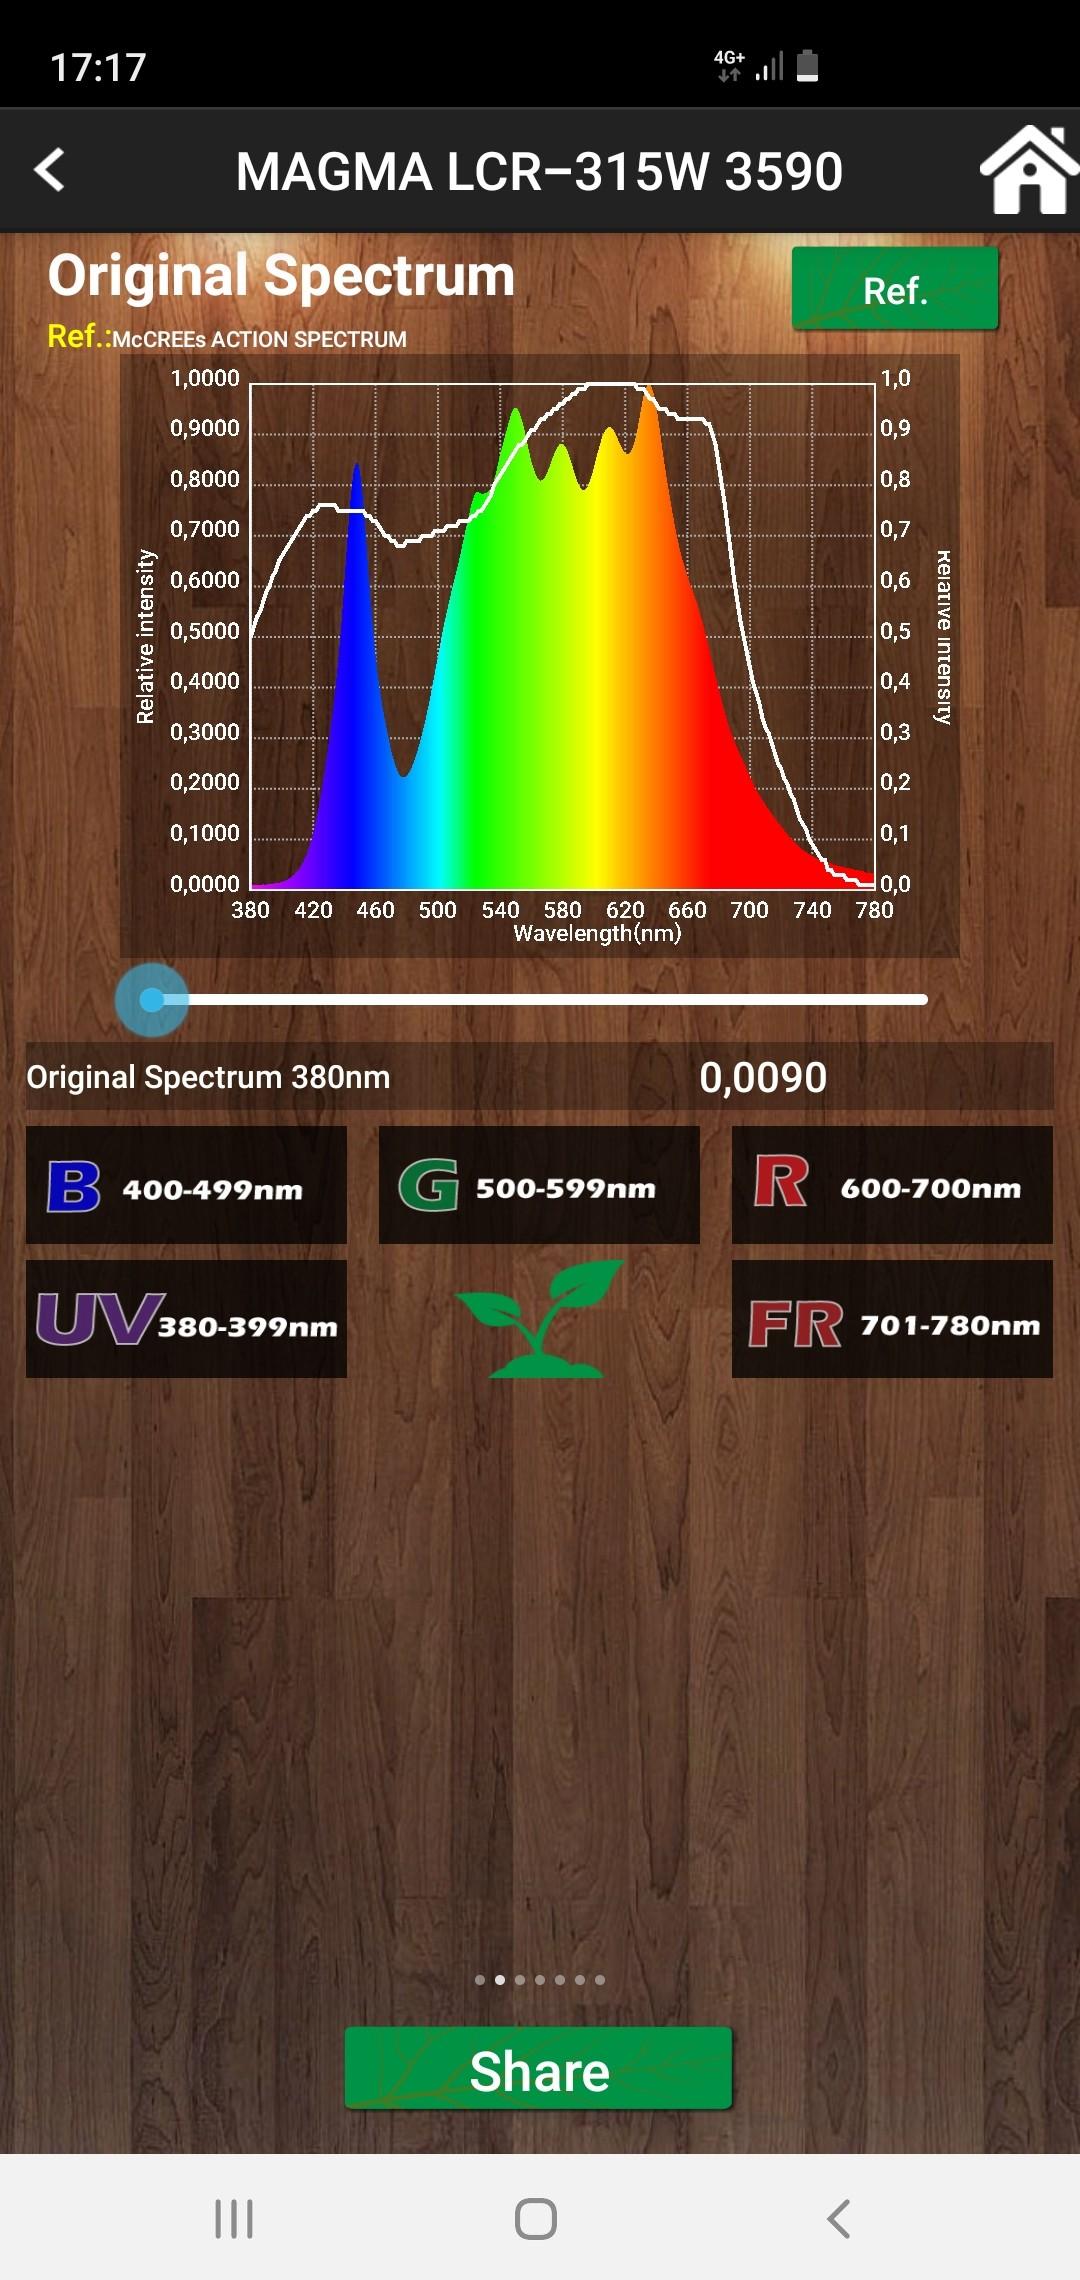 luminaria-led-magma-lcr-315w-cree-3590-lumilight 3